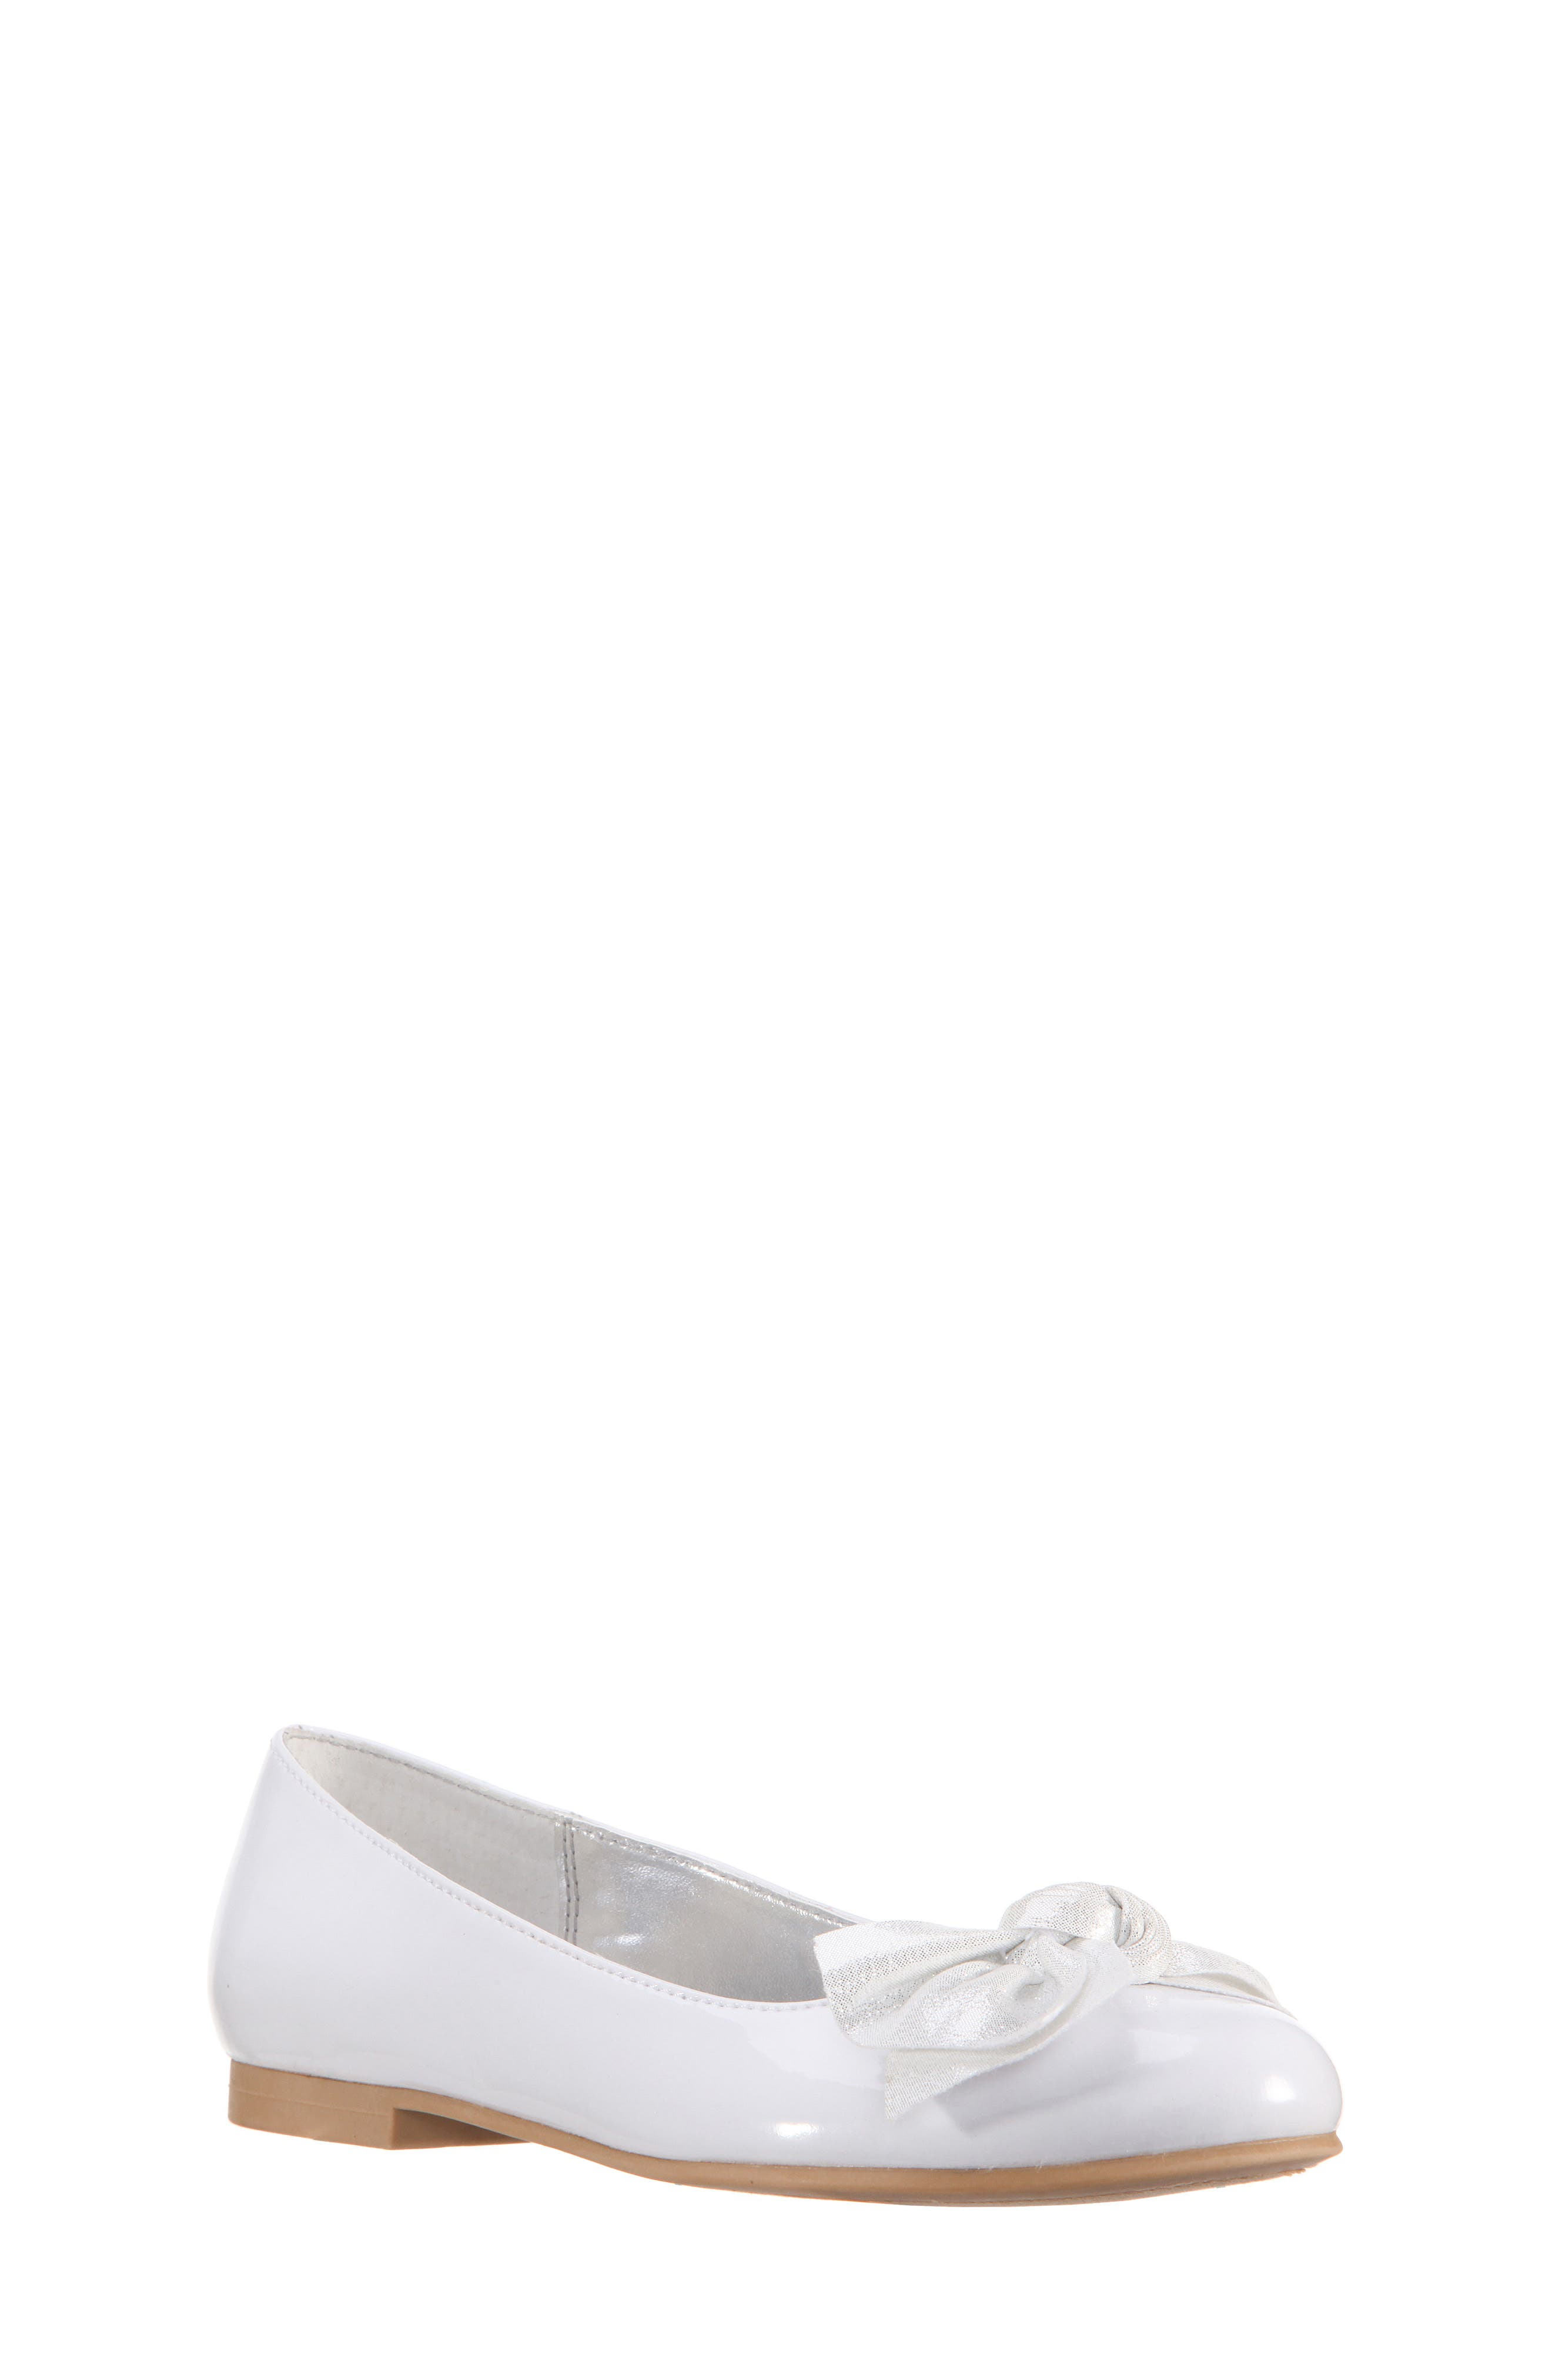 Katelyn Glitter Bow Metallic Ballet Flat,                         Main,                         color, White Patent